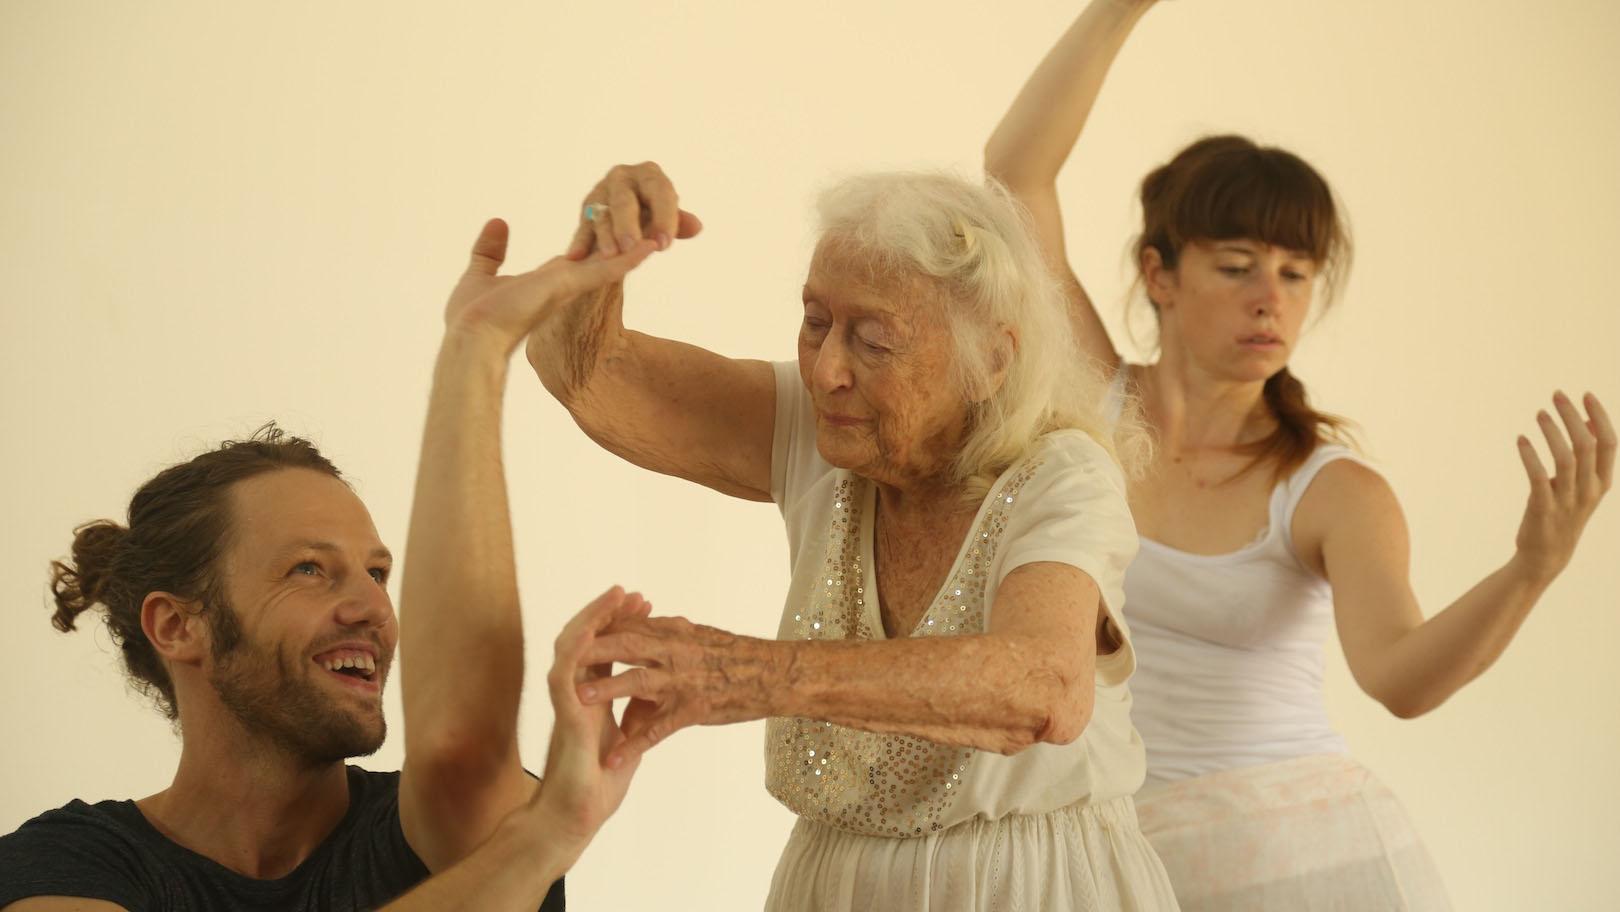 Meet 100-year-old Eileen Kramer. She's the longest-living working choreographer and dancer